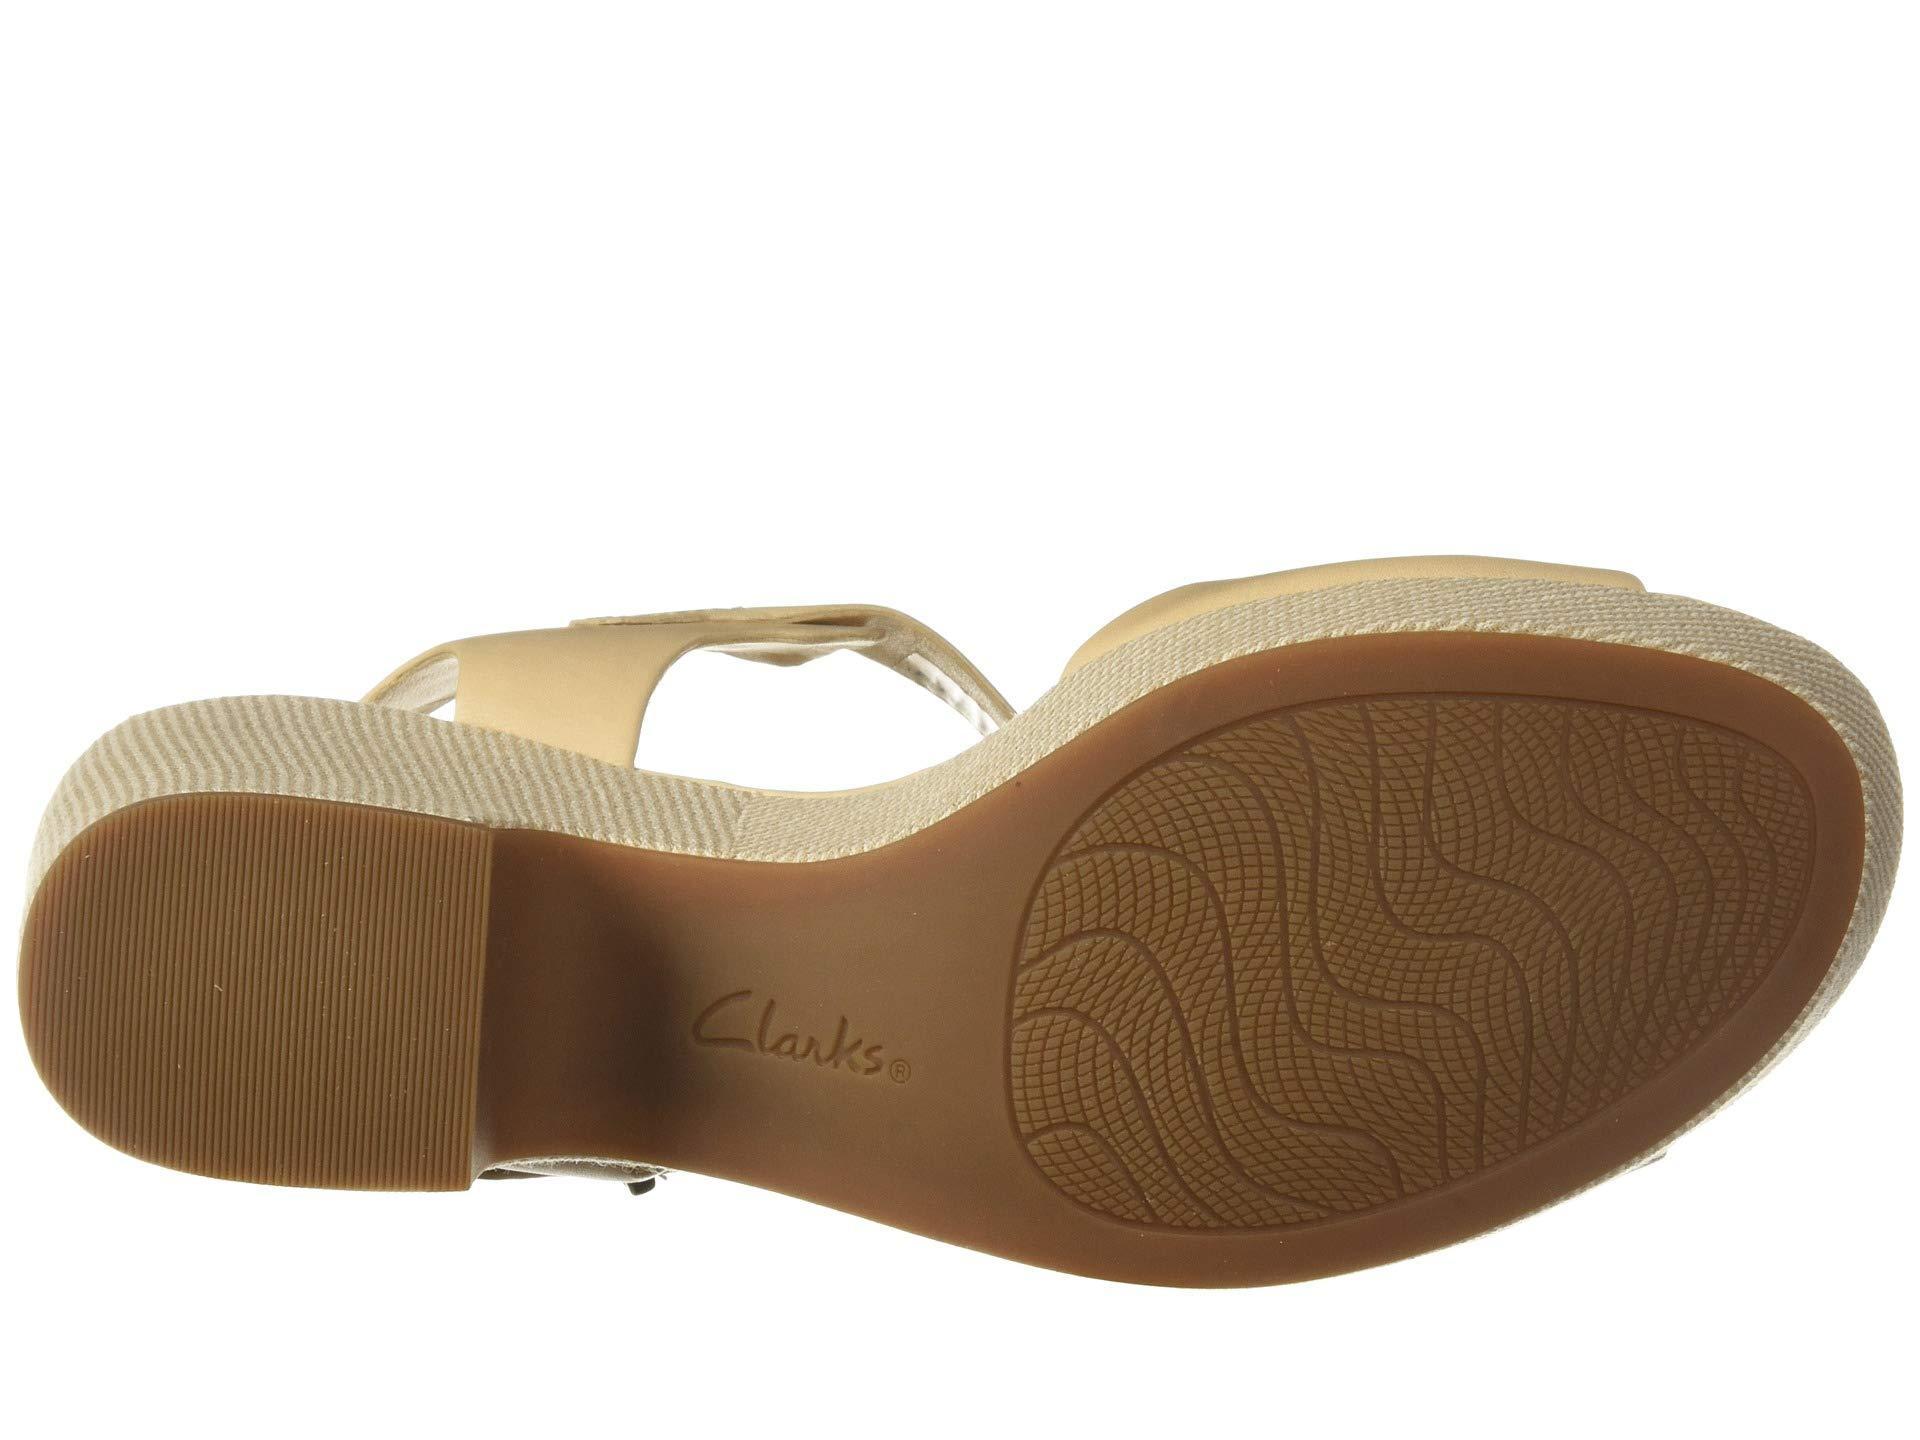 0cfefb84692f Clarks - Natural Maritsa Janna (black Leather) High Heels - Lyst. View  fullscreen